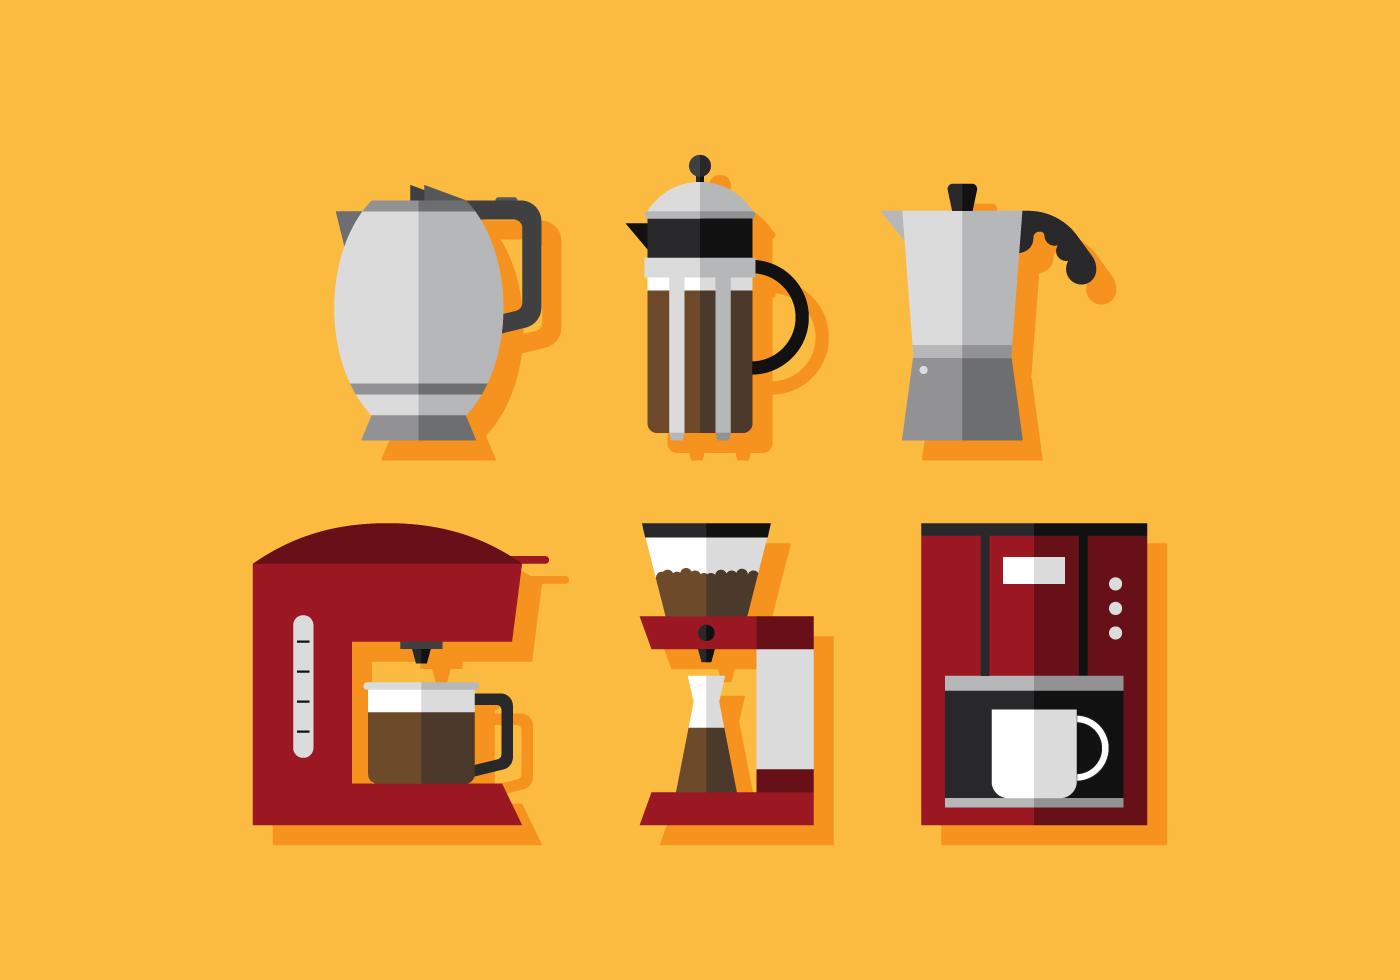 Coffee Maker Free Vector Art 2 804 Free Downloads